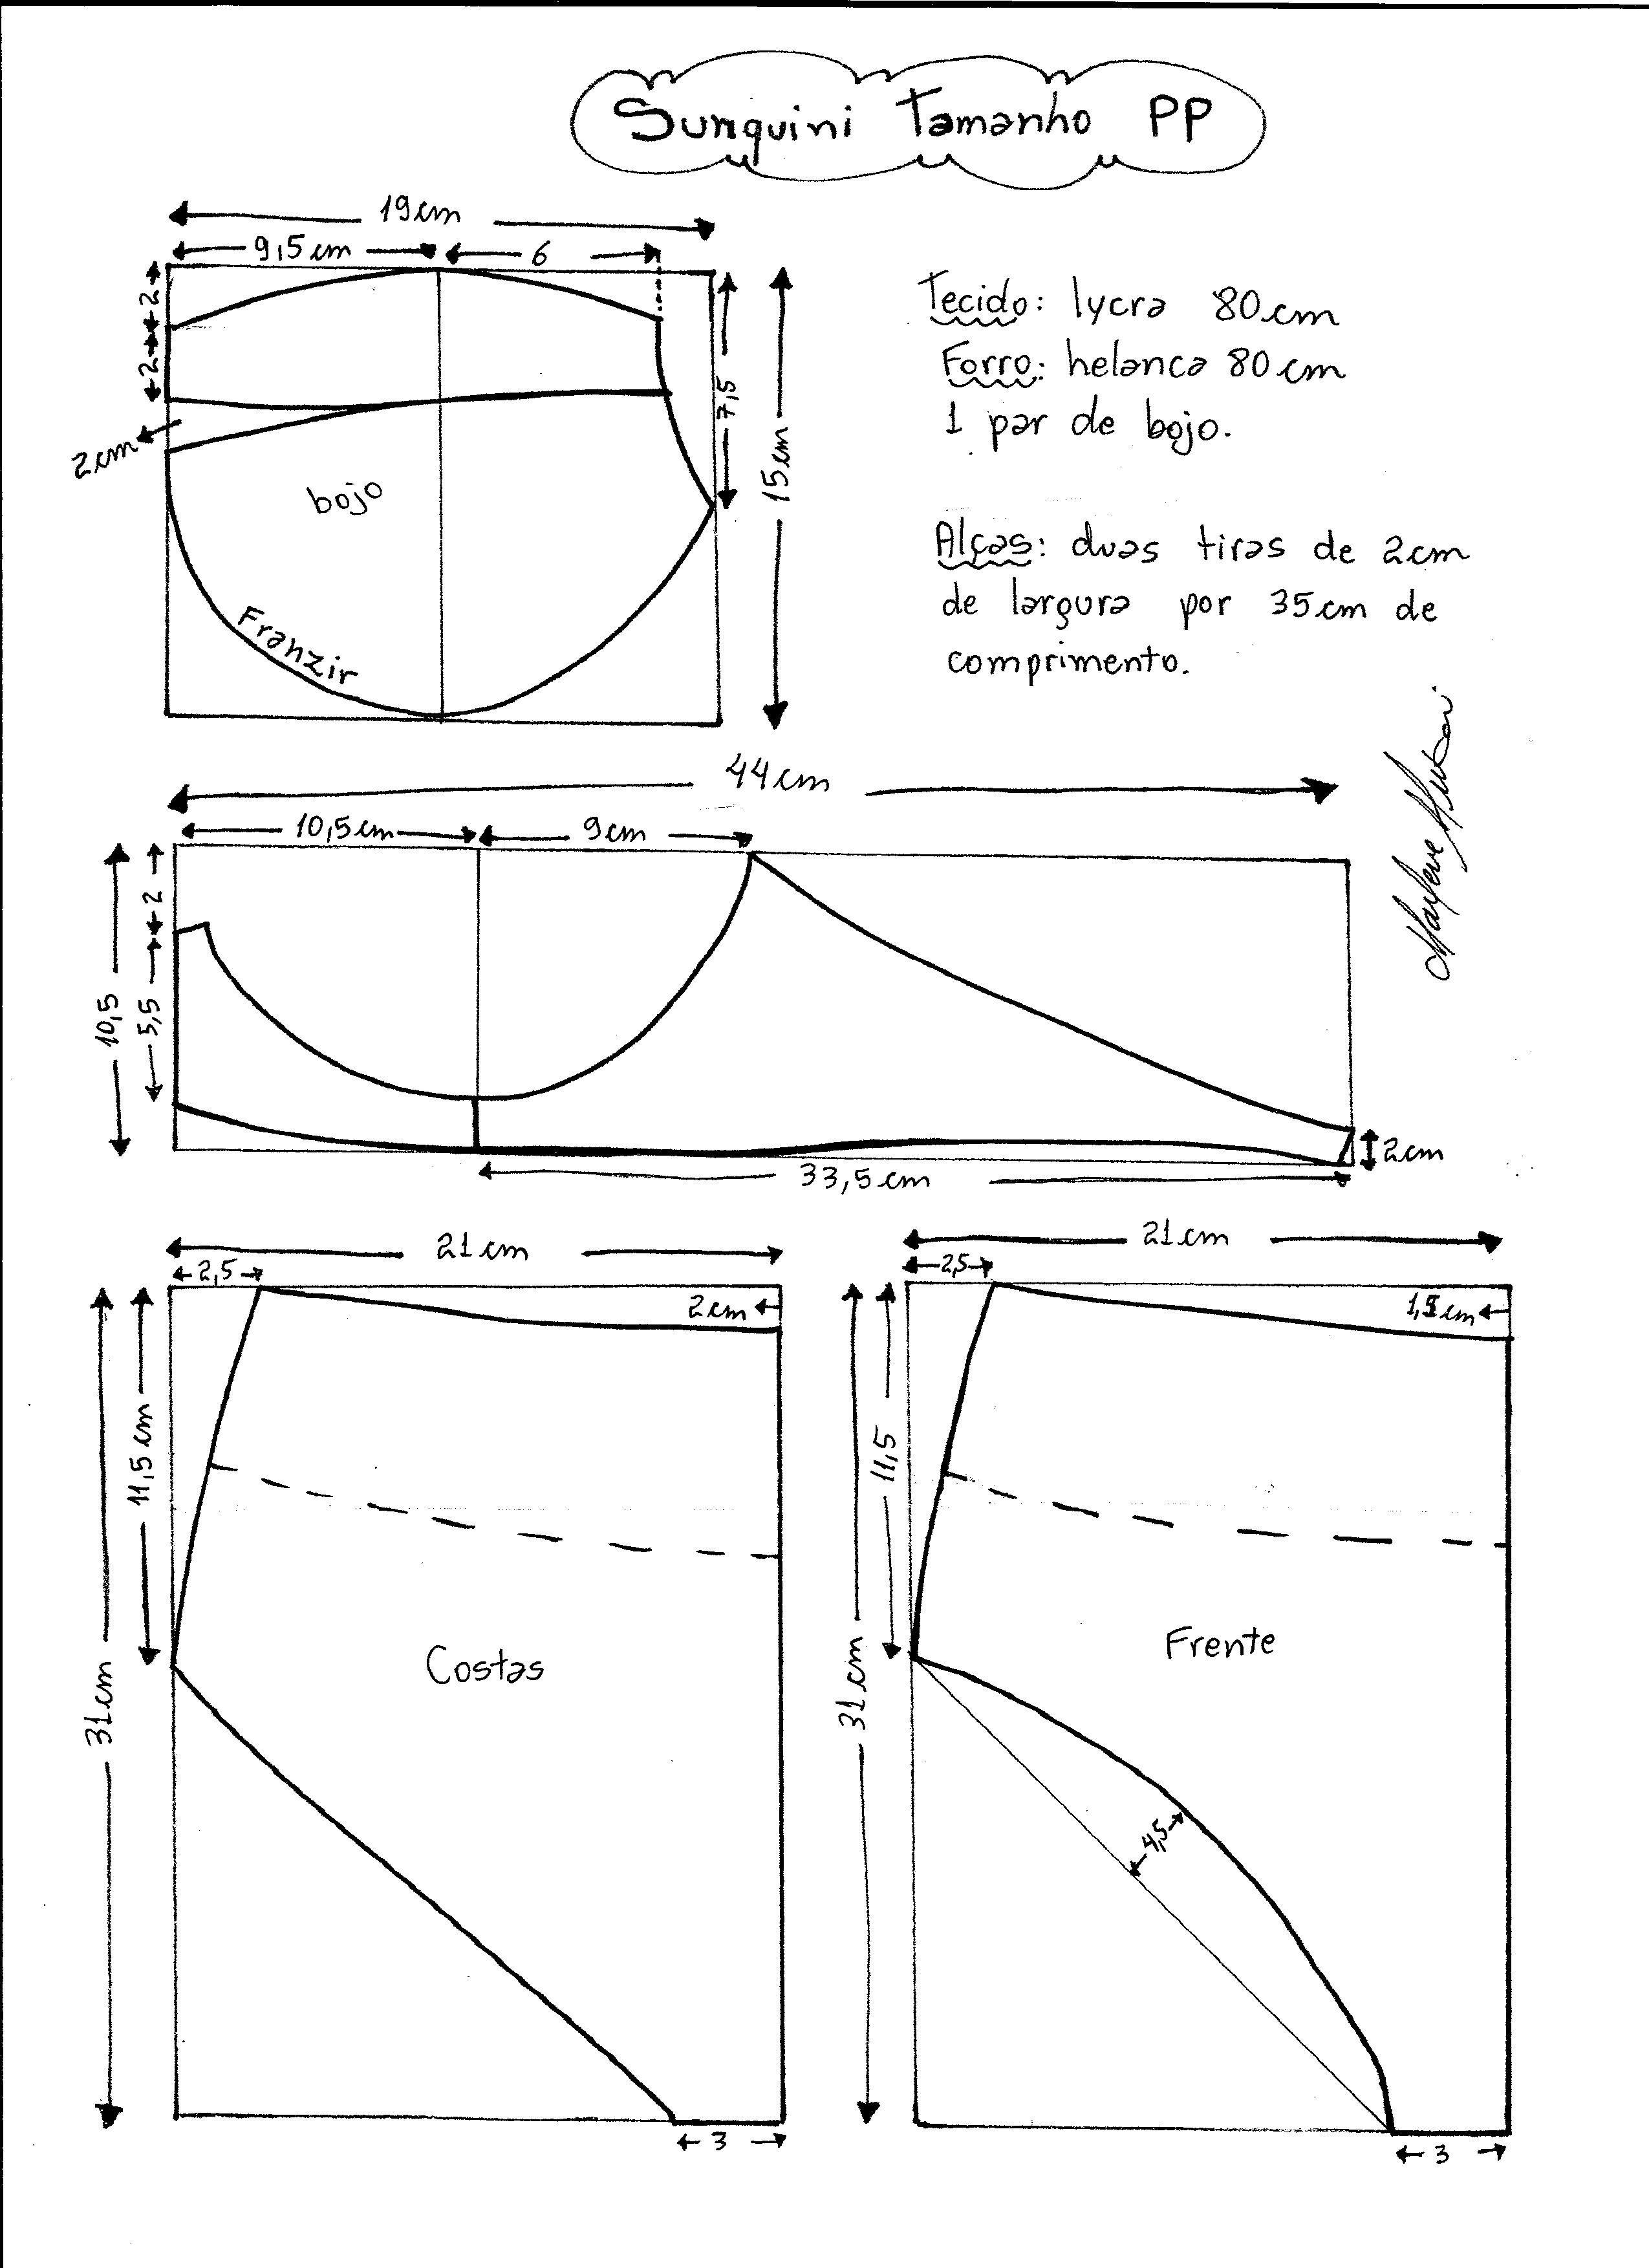 Biquini Retrô tipo Sunquini | Escalada, Costura y Molde